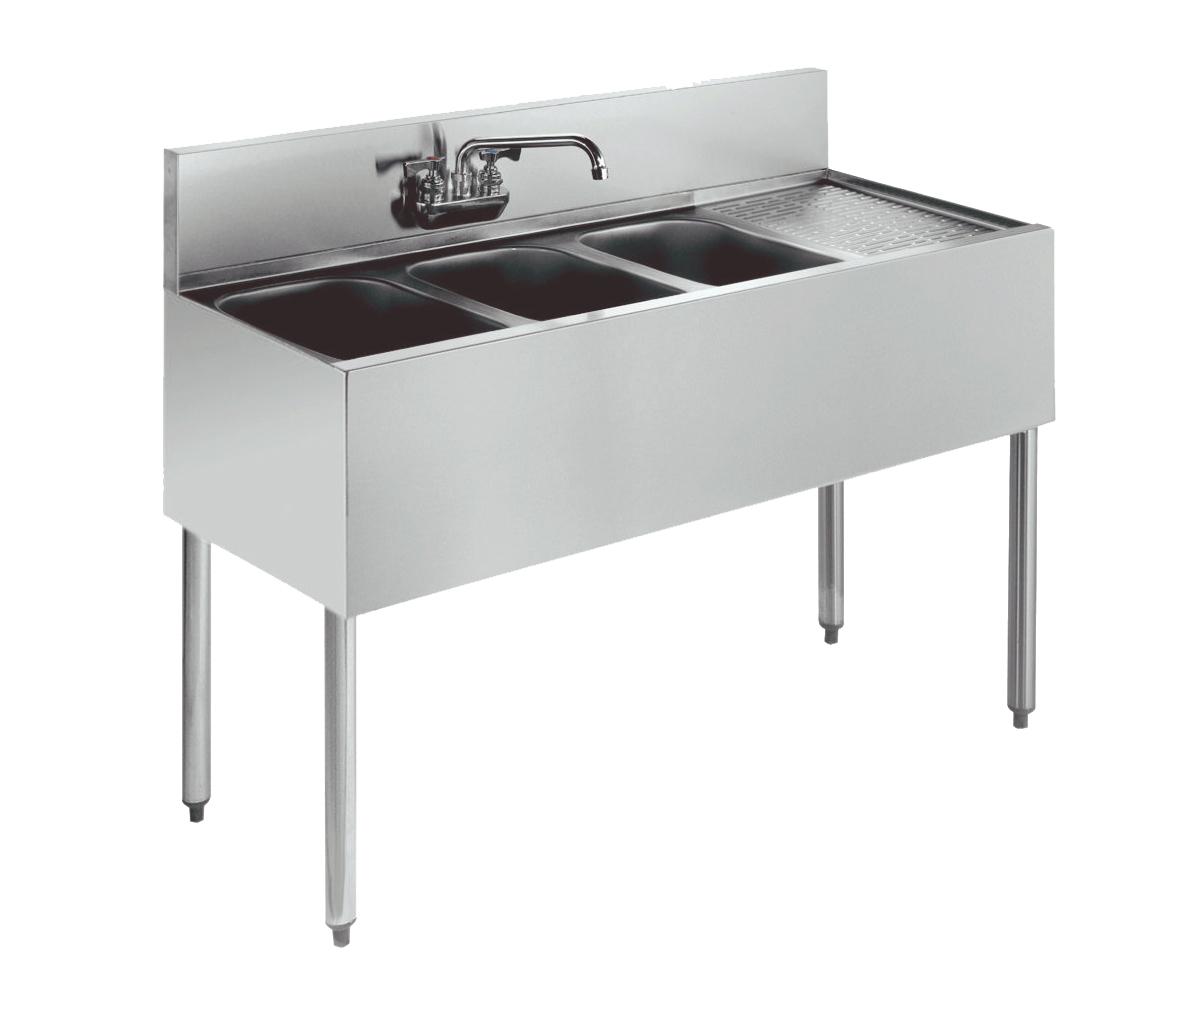 Krowne Metal 21-43L underbar sink units